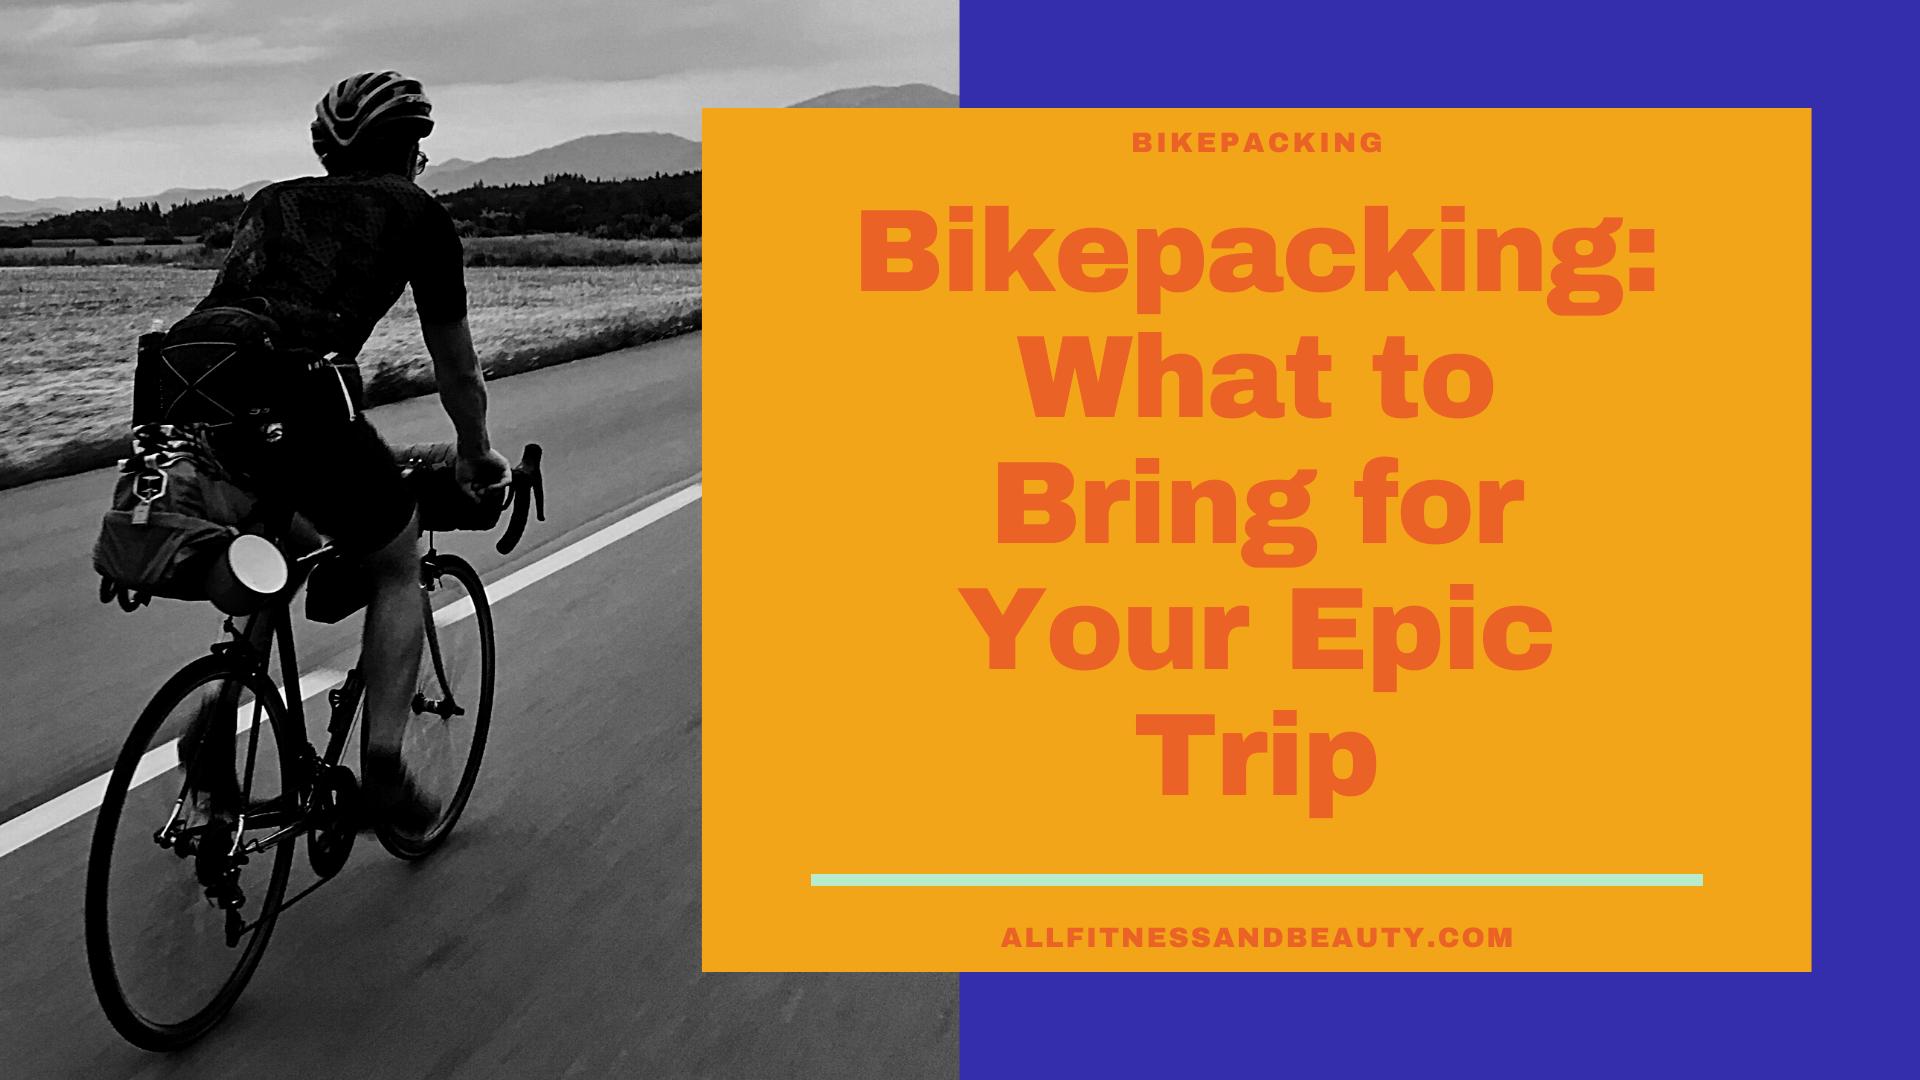 bikepacking what to bring